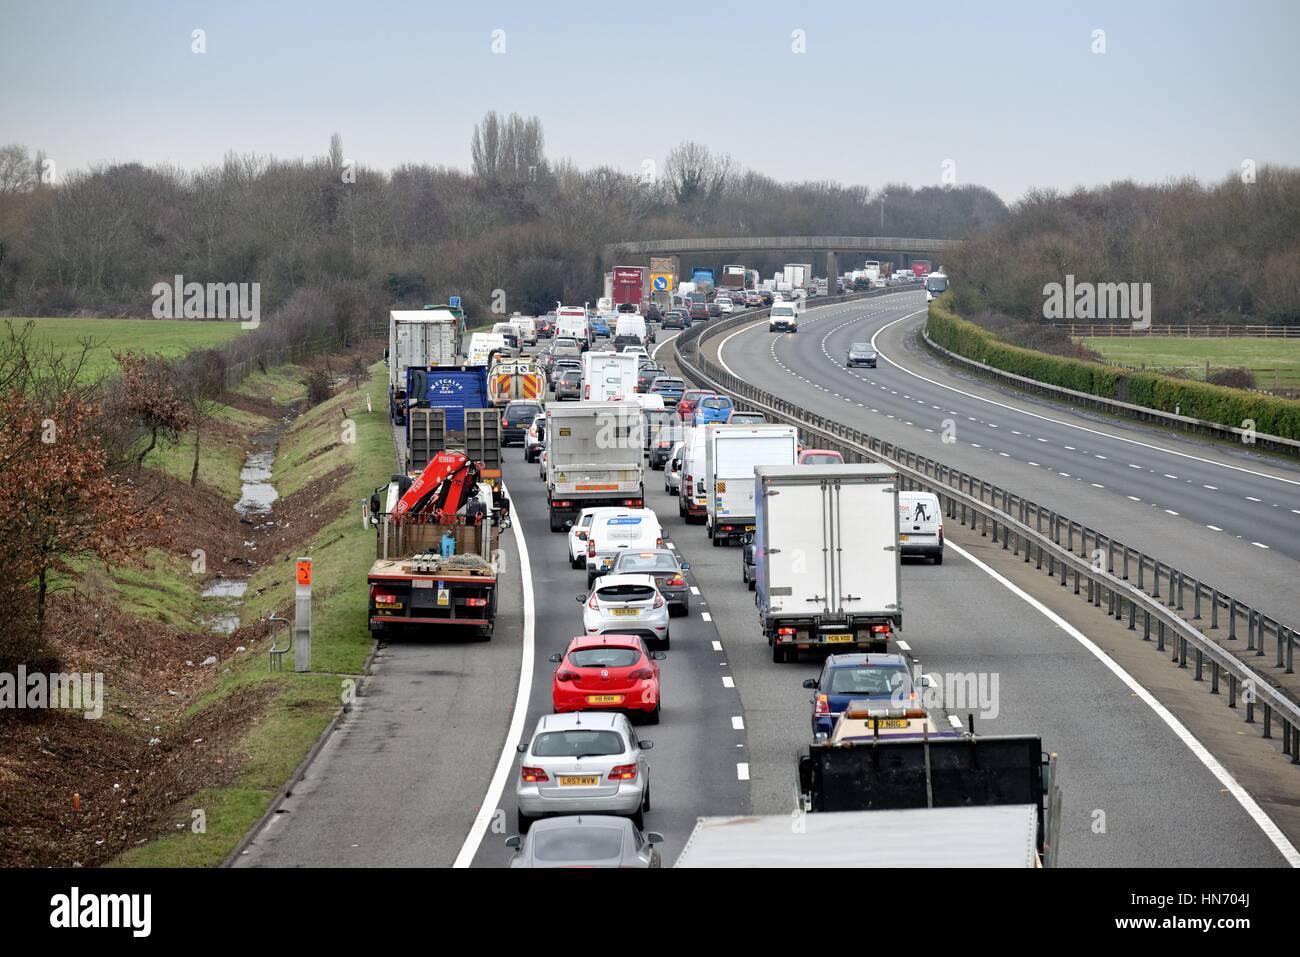 Stationary traffic on the M3 motorway at Shepperton Surrey UK - Stock Image